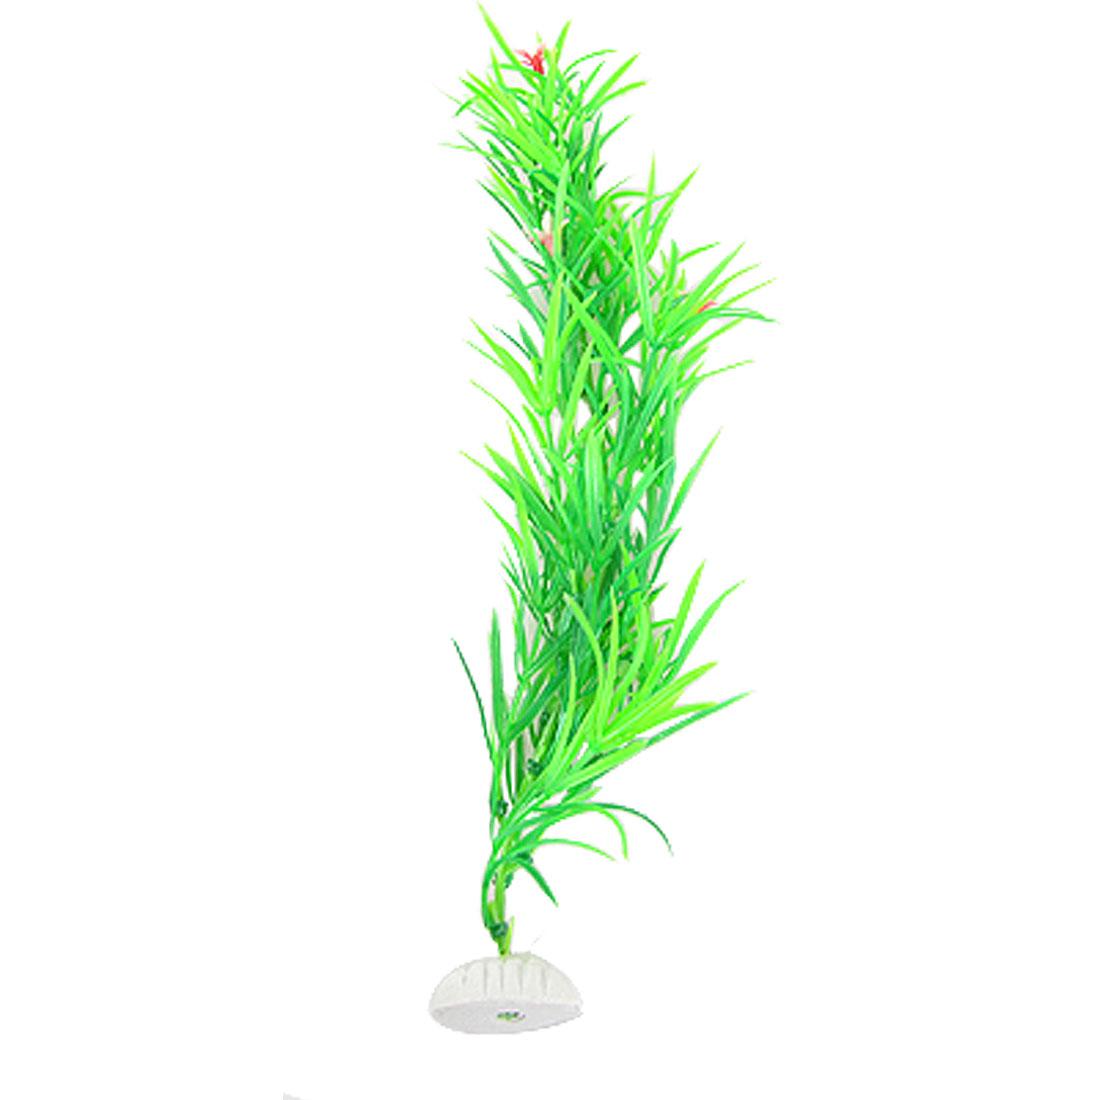 Aquarium Aquascaping Plastic Grass Red Flower Green Plants